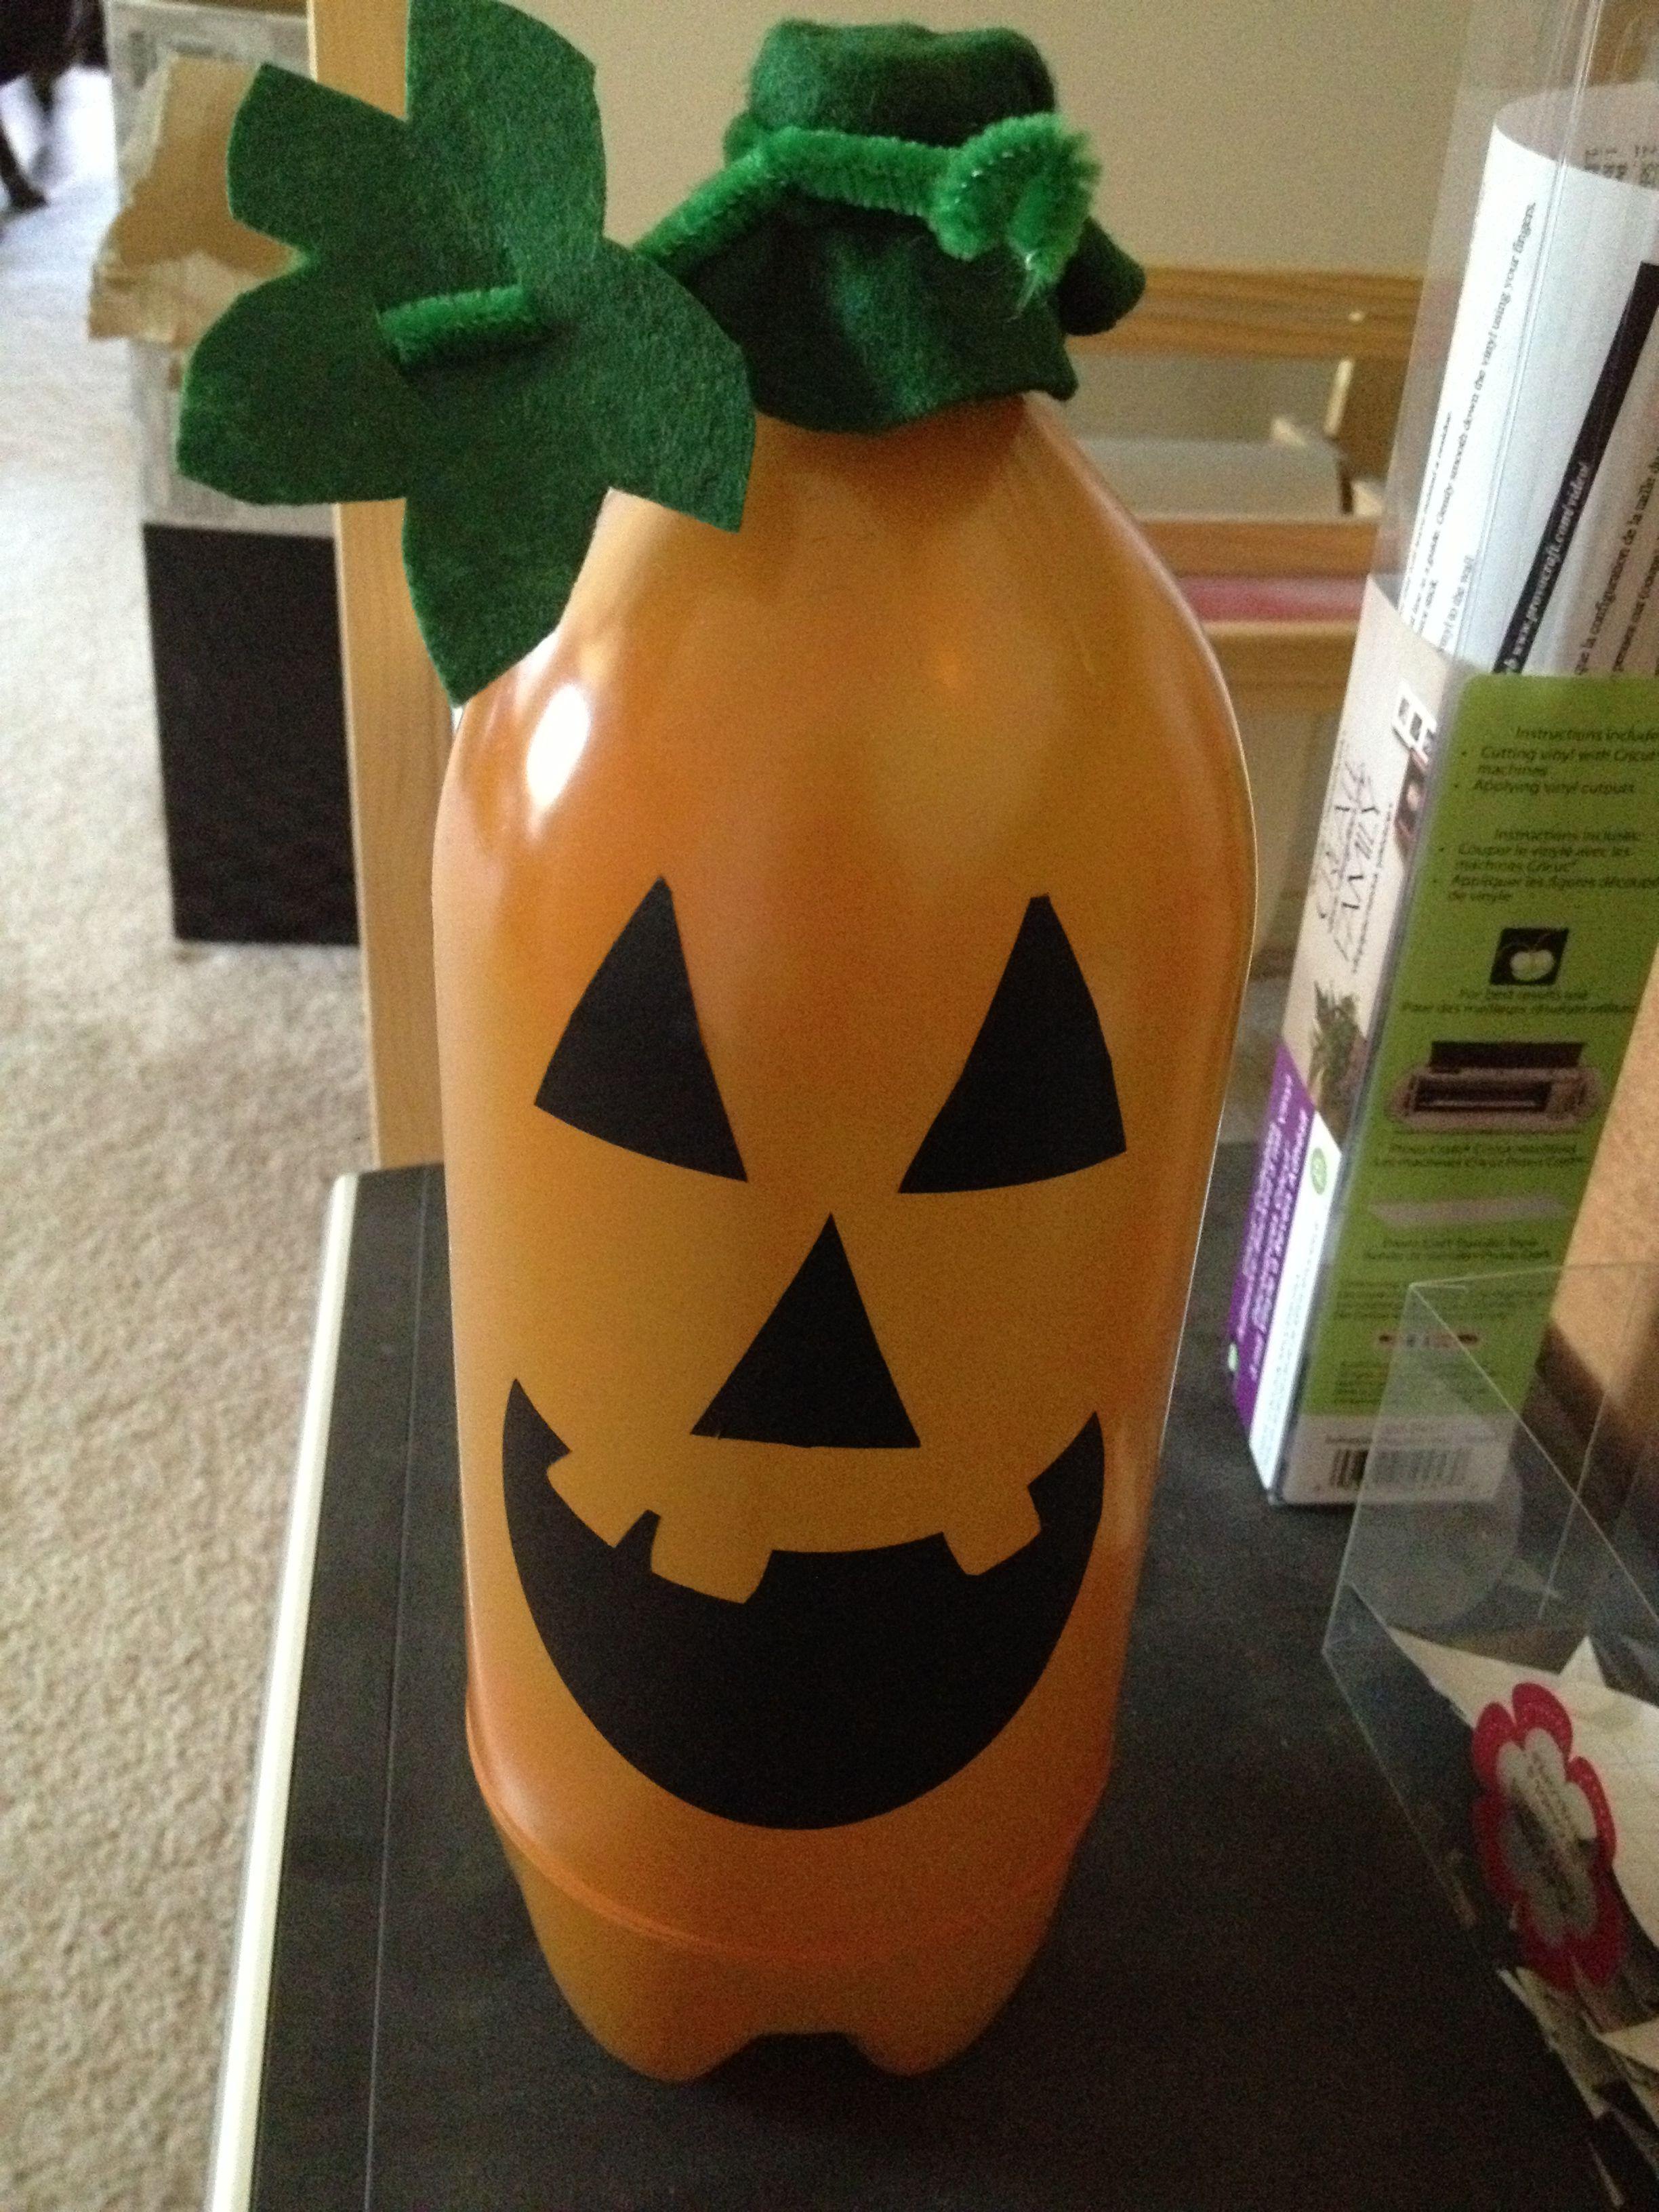 fall crafts | fall | diy fall crafts | soda pop bottle crafts | soda pop bottles | diy crafts